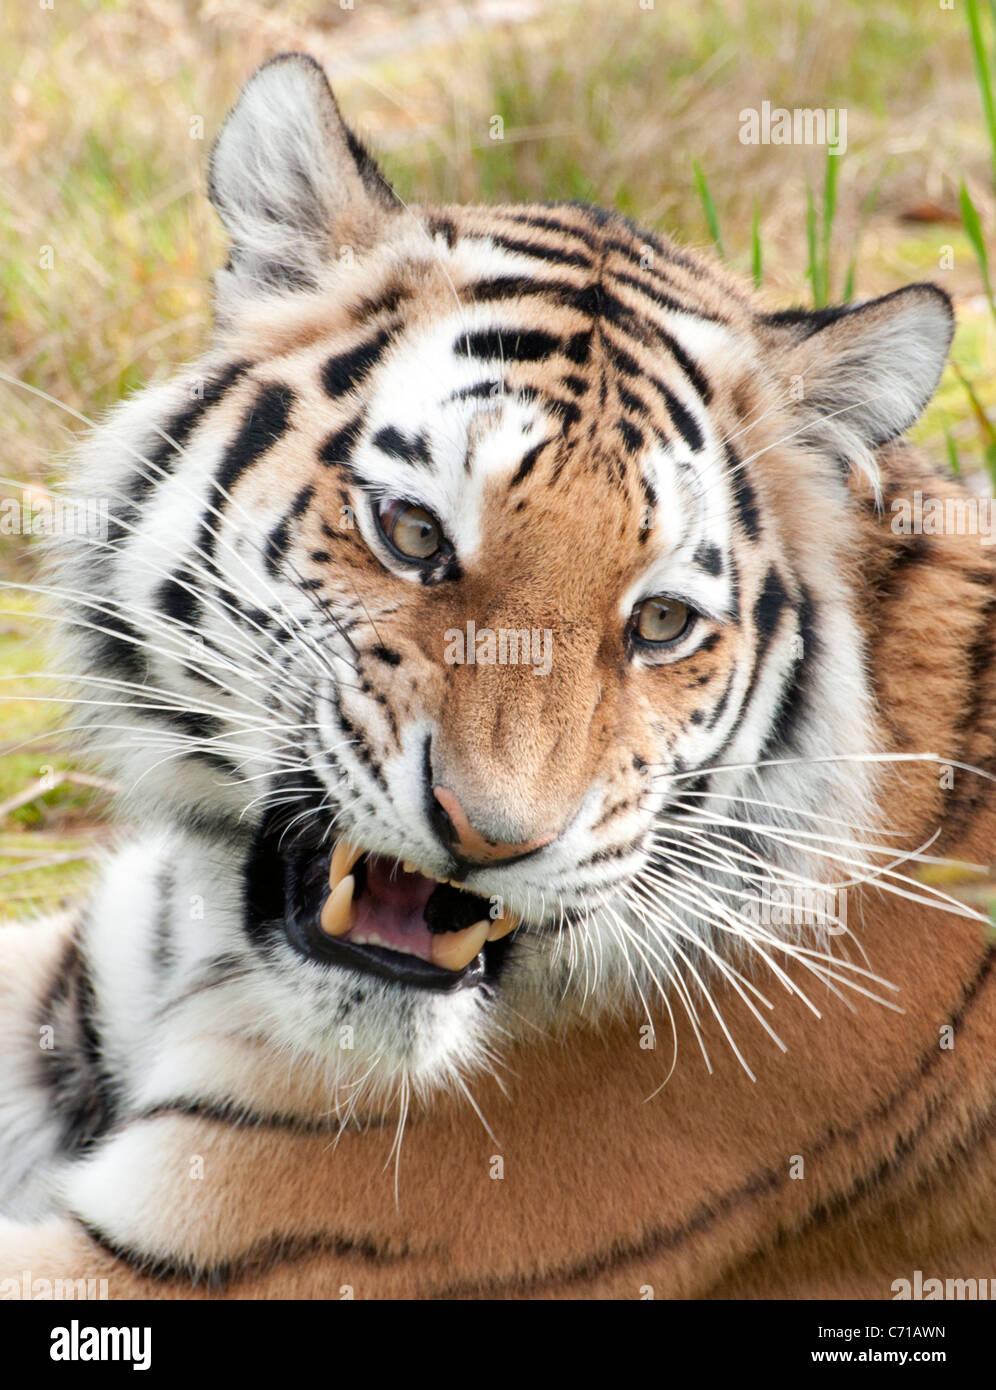 Female Amur tiger snarling - Stock Image